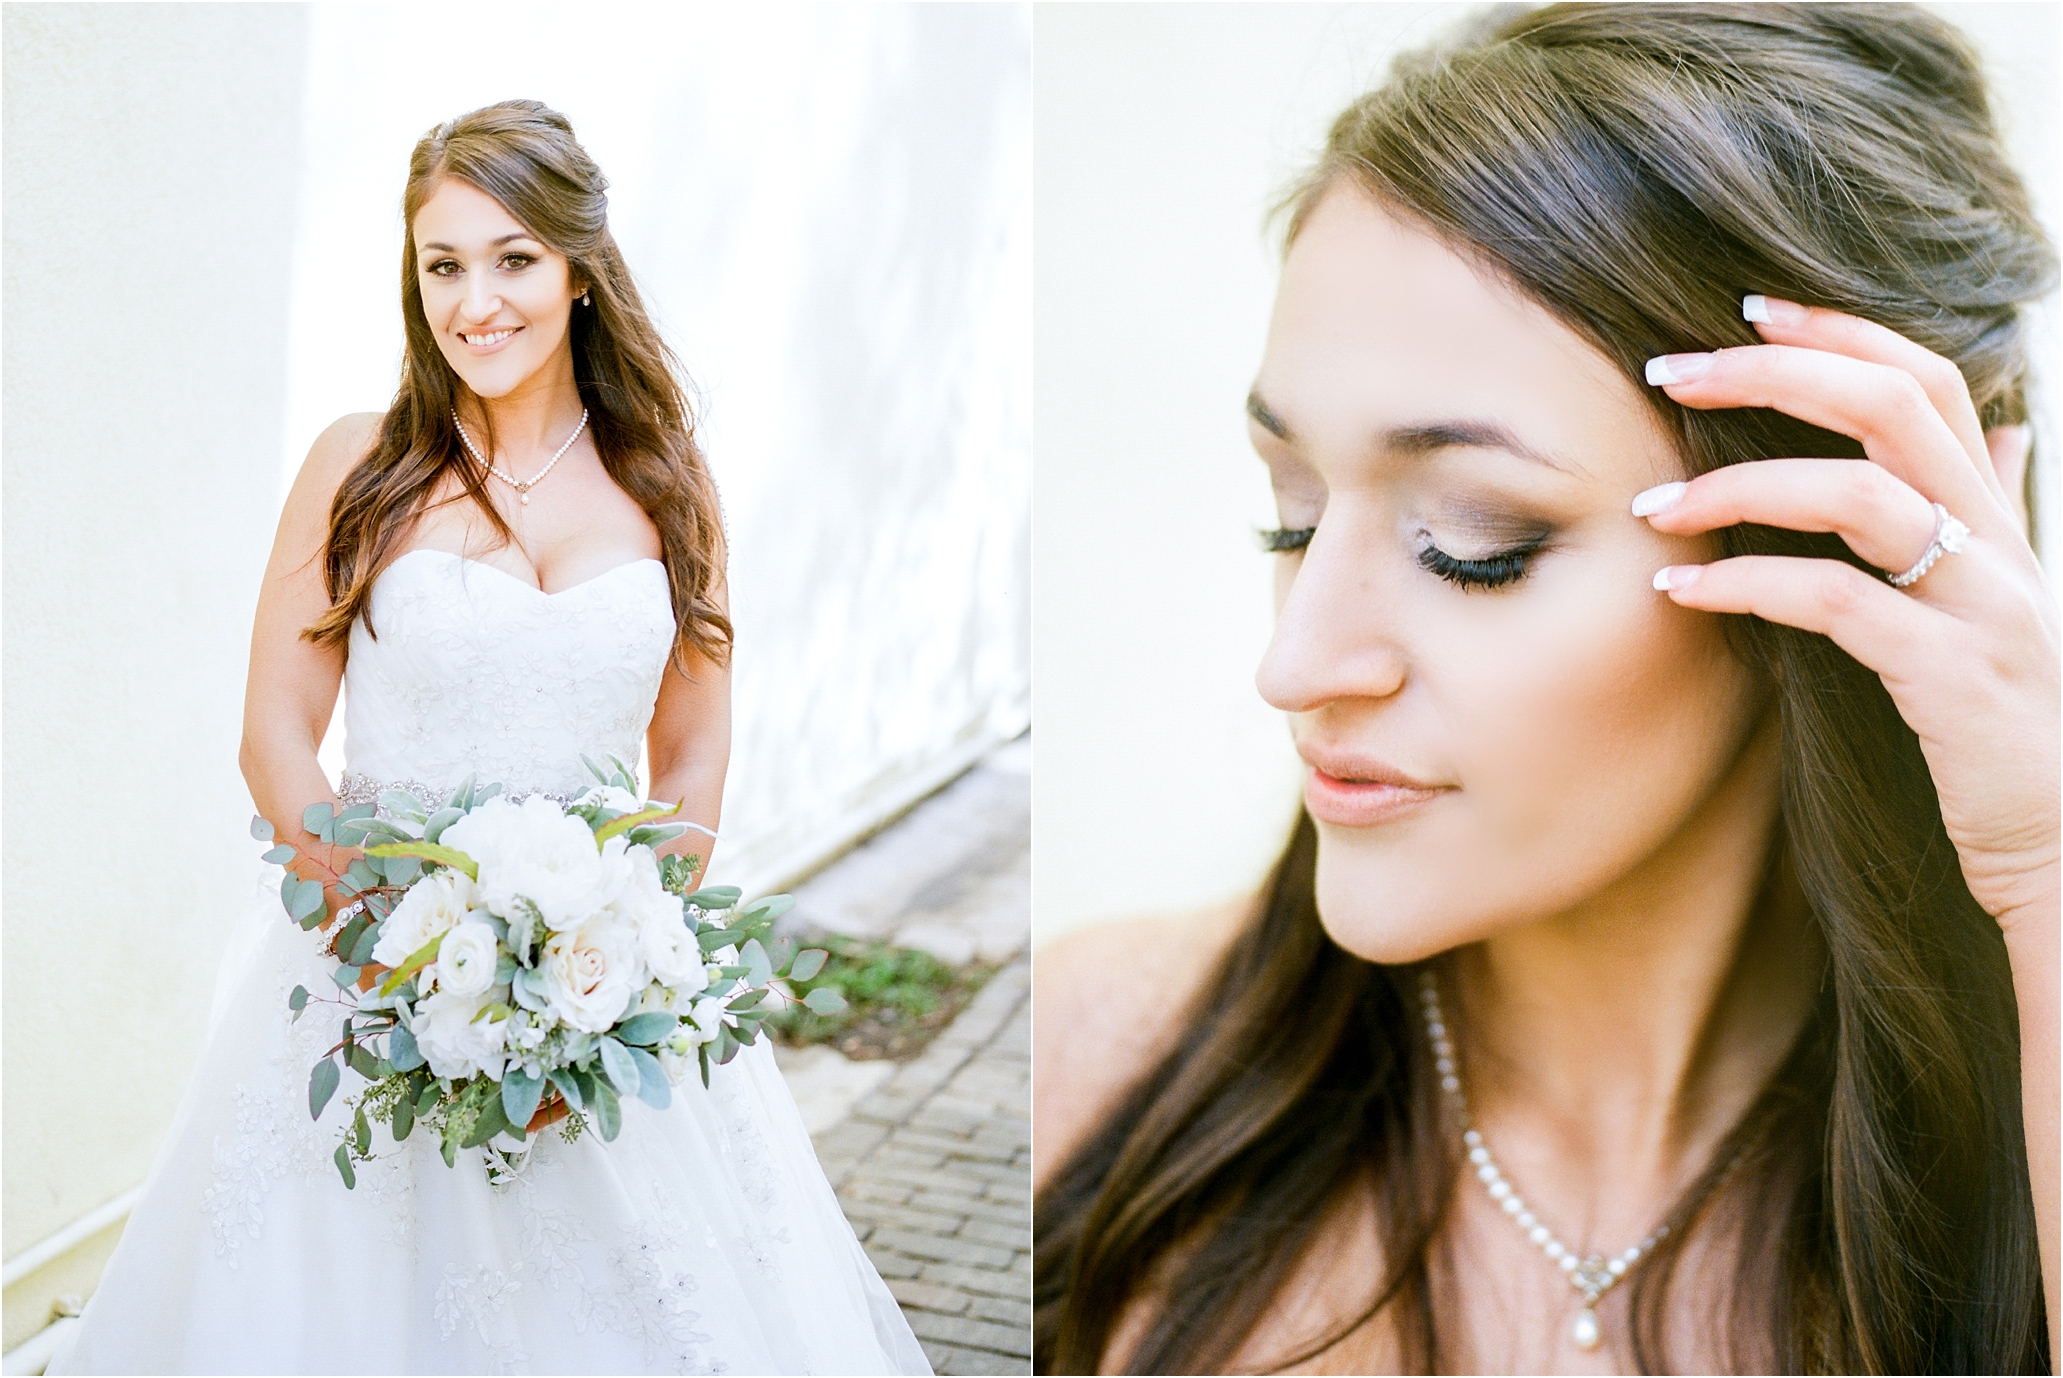 Lisa Silva Photography- Ponte Vedra Beach and Jacksonville, Florida Fine Art Film Wedding Photography- Wedding at The White Room Villa Blanca in St. Augustine, Florida_0015.jpg